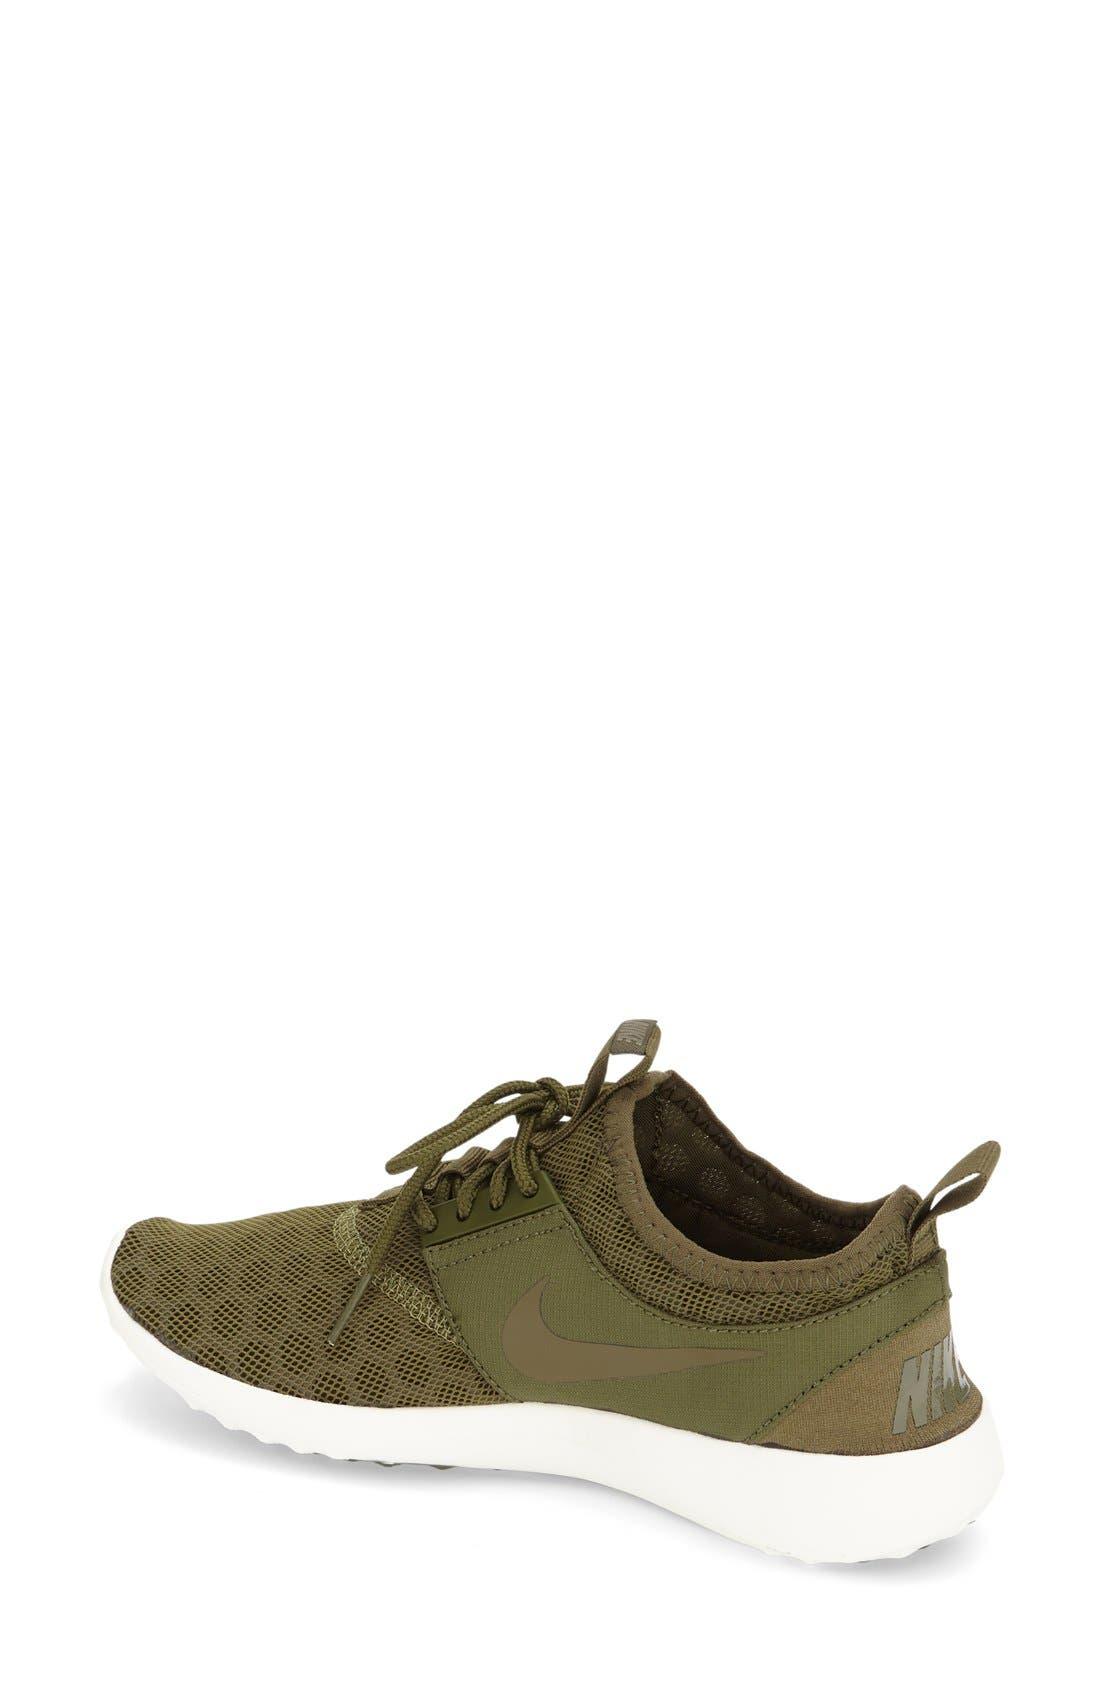 Juvenate Sneaker,                             Alternate thumbnail 222, color,